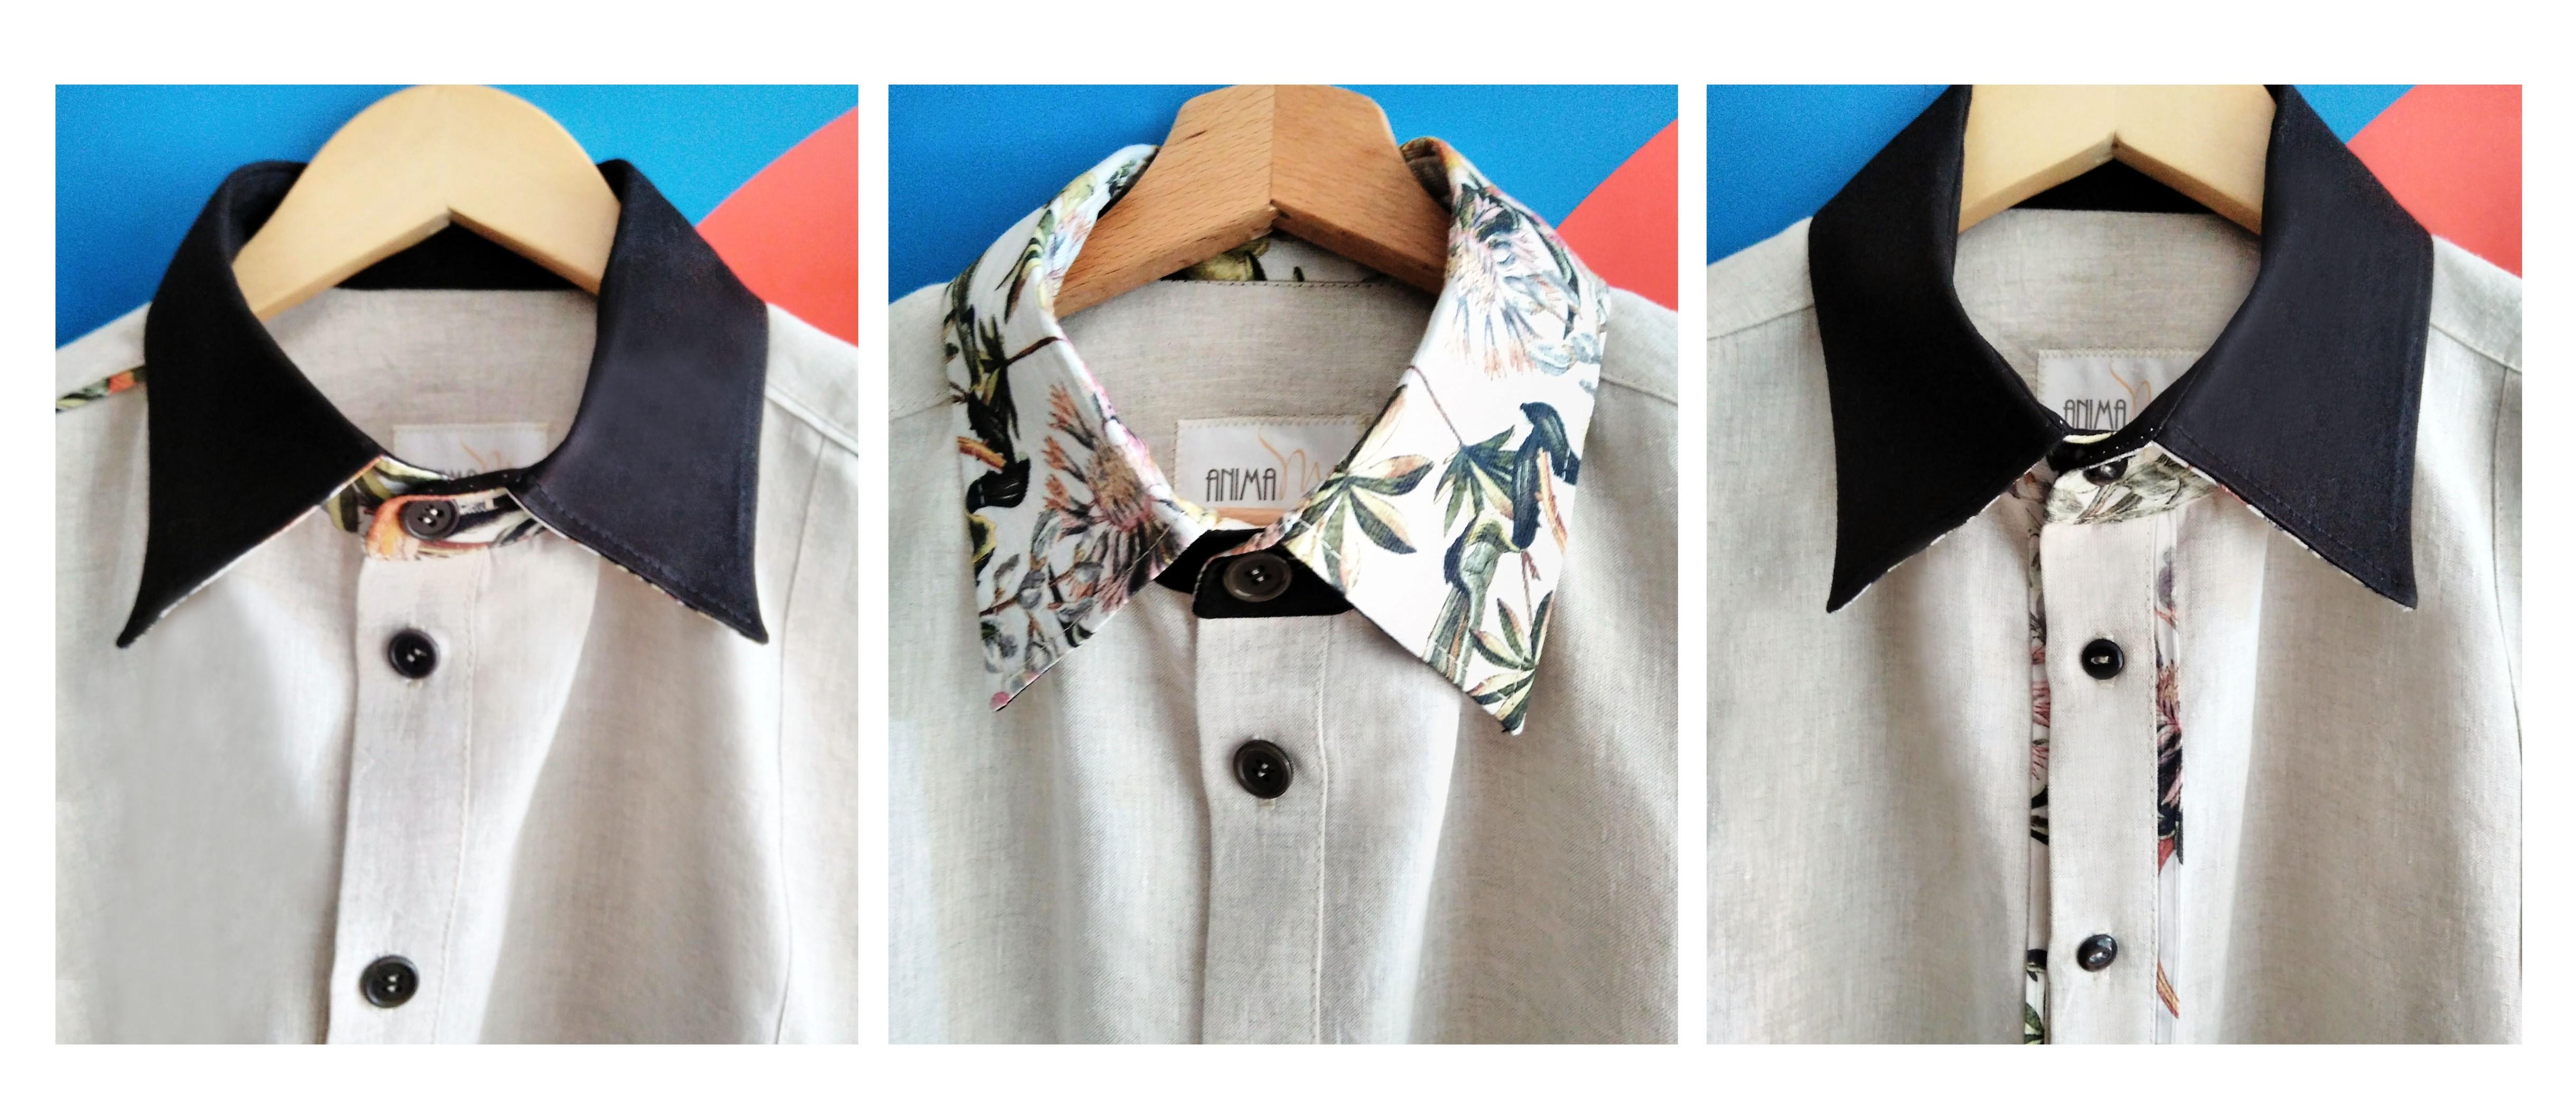 Anima M. Men's fashion